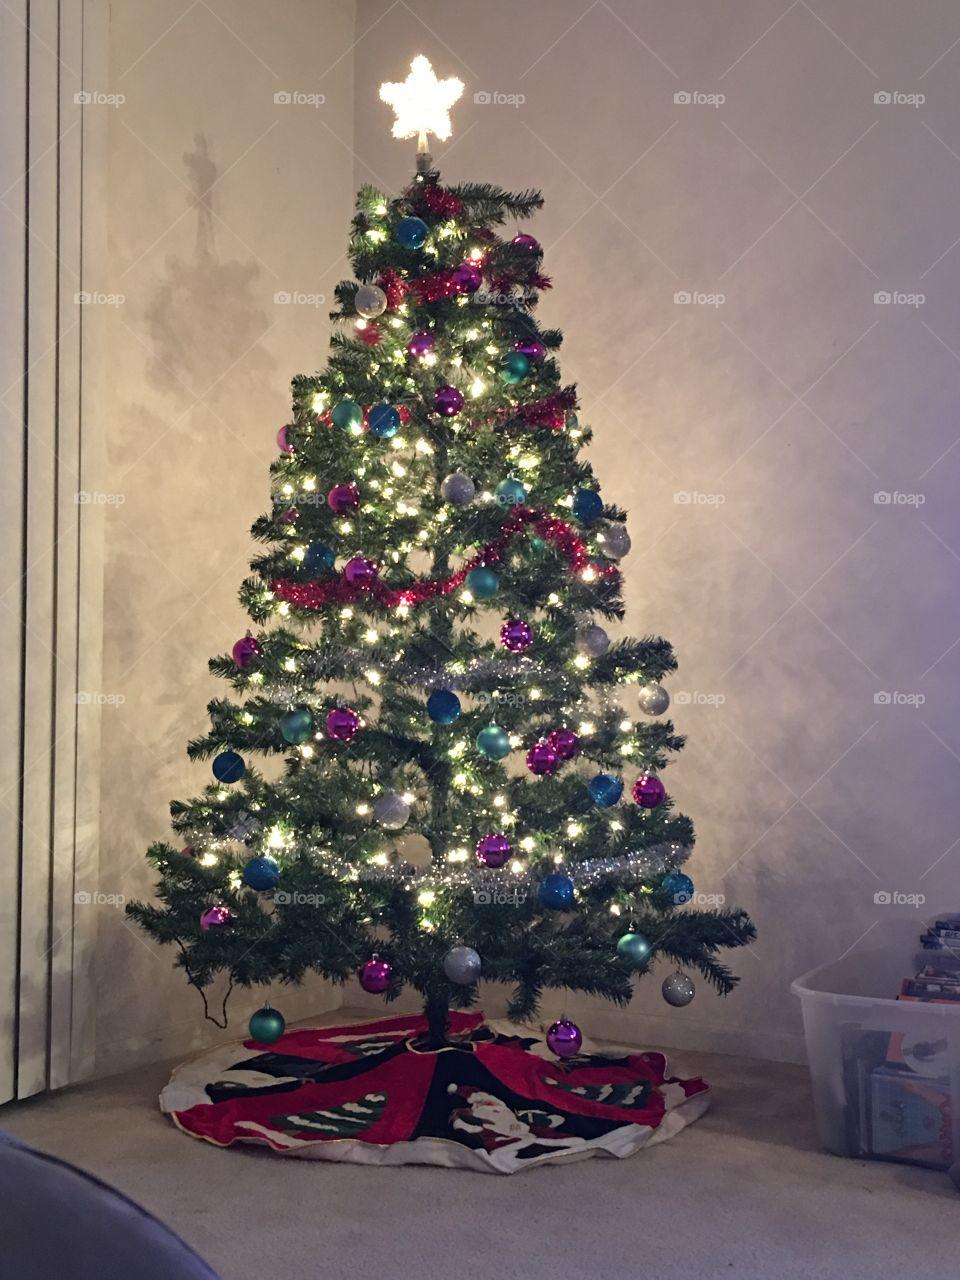 Oh Christmas tree